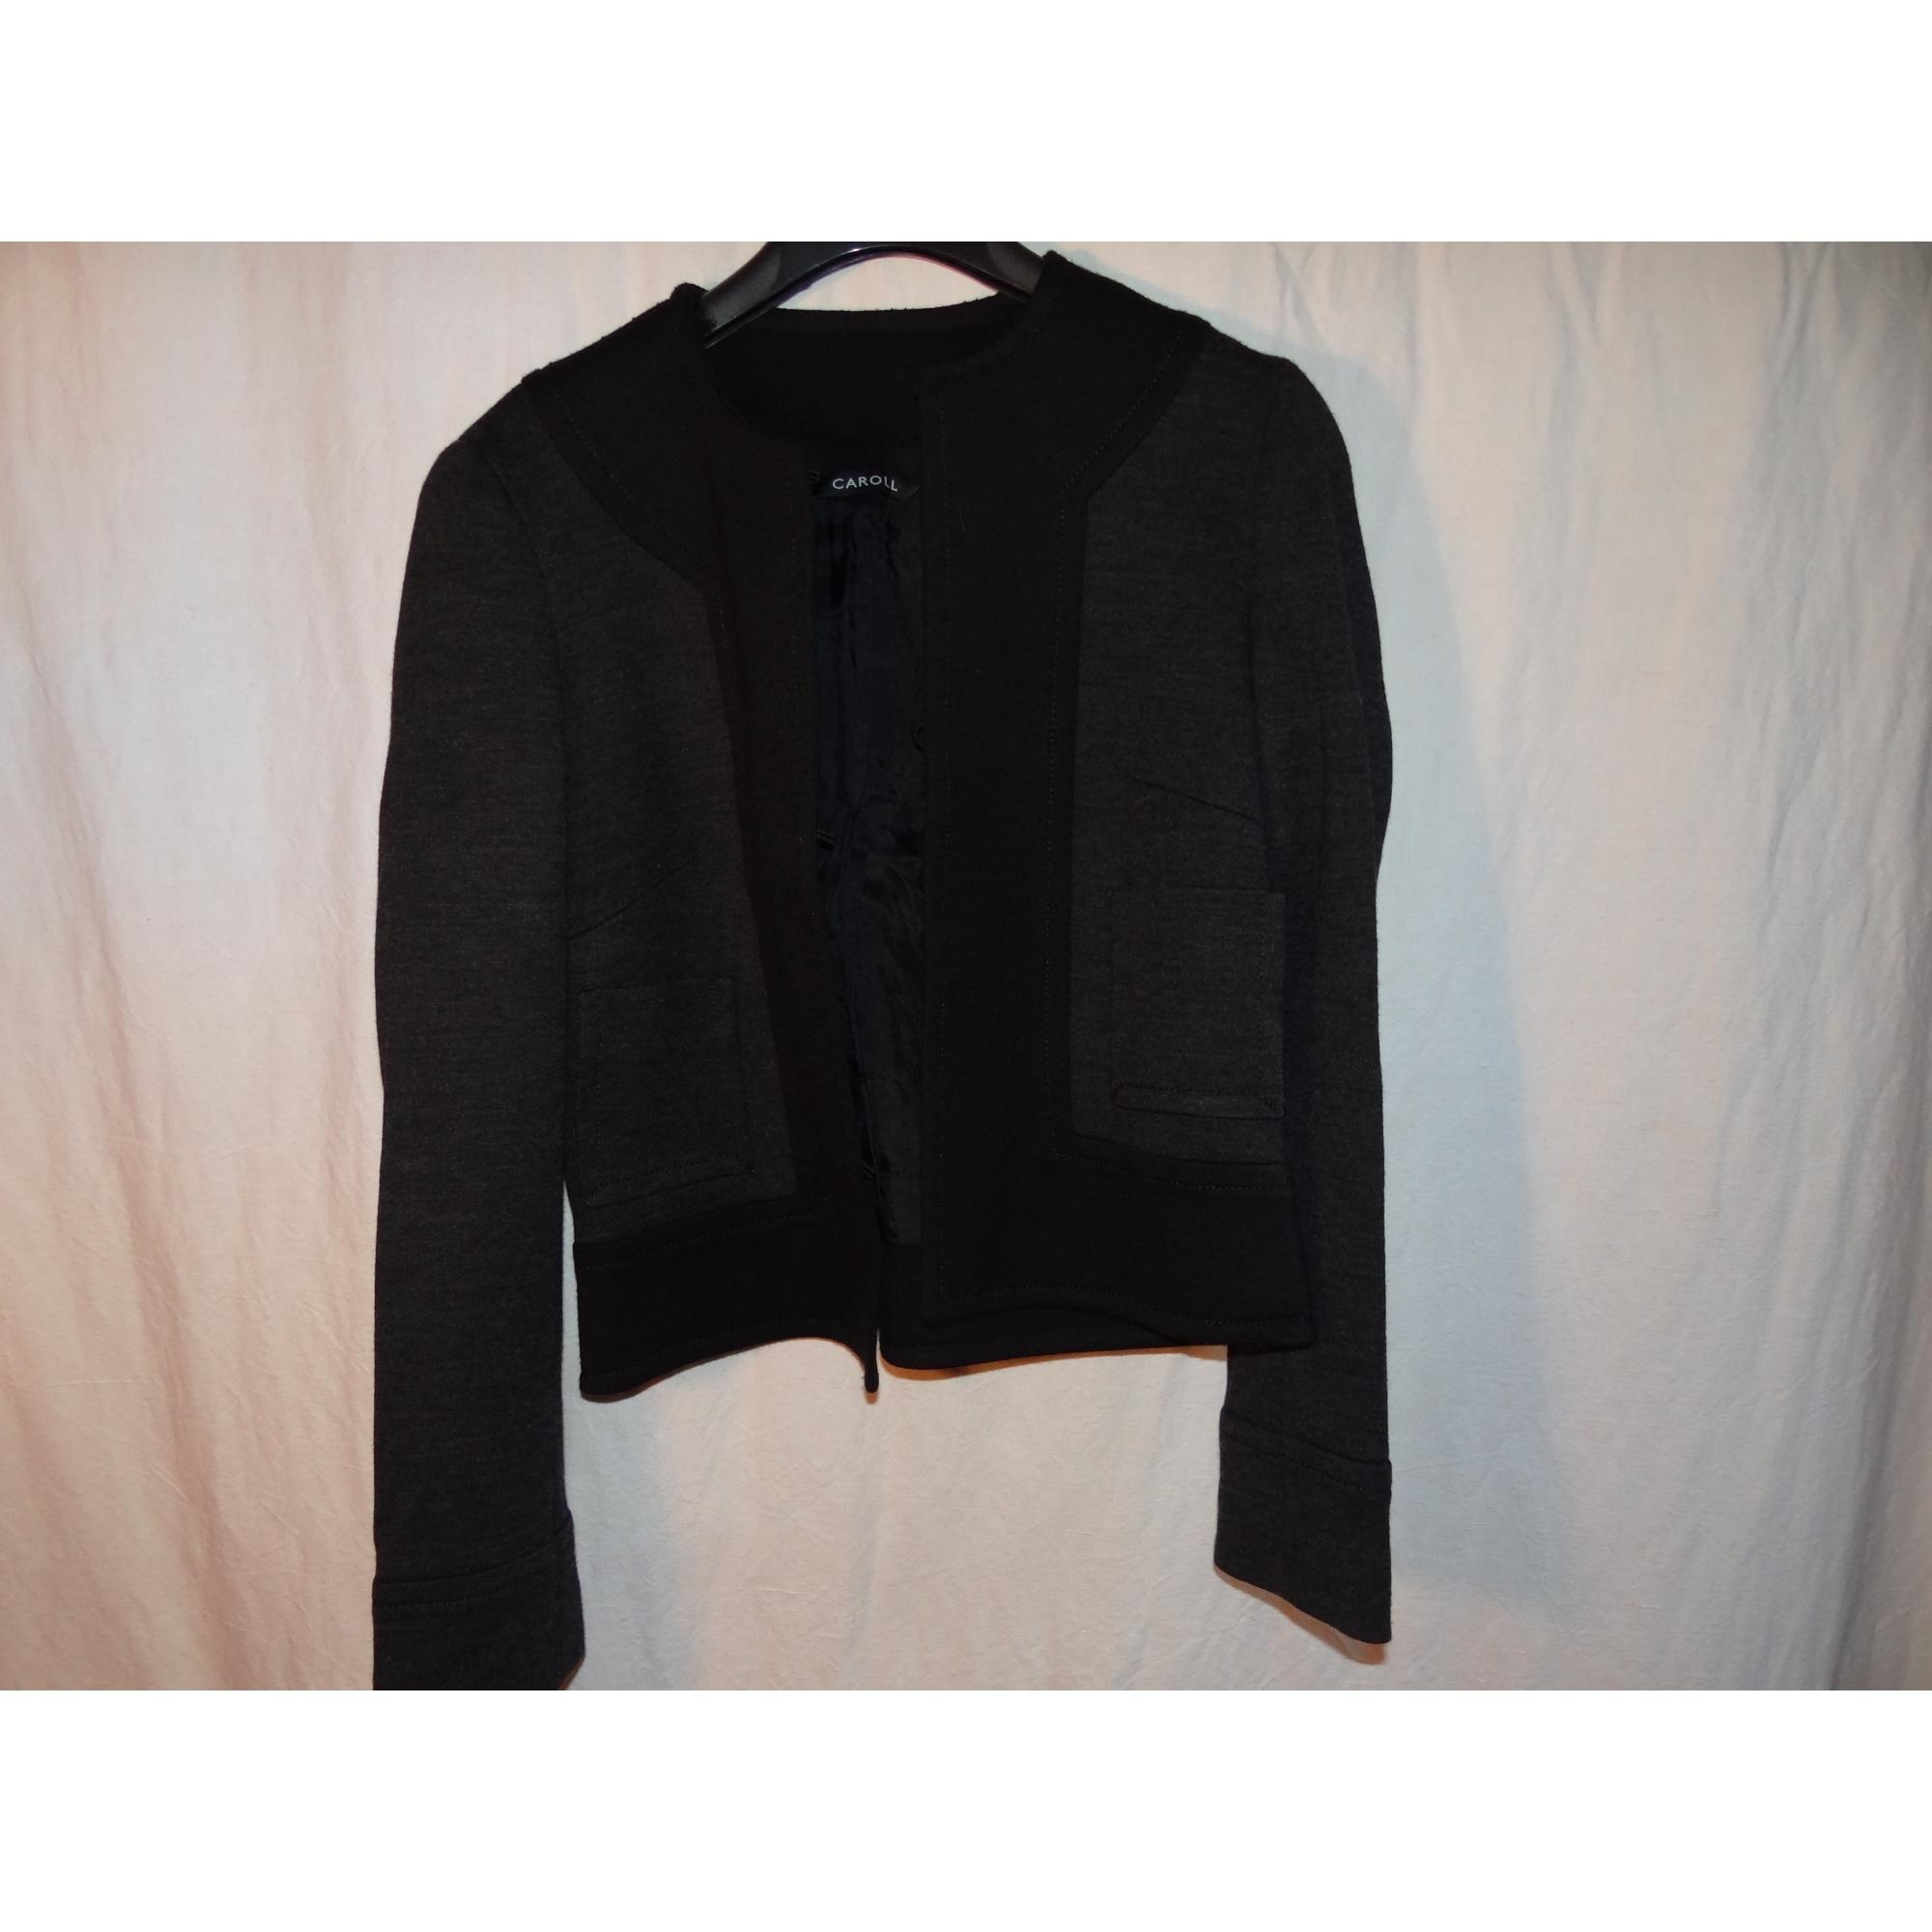 Blazer, veste tailleur CAROLL Gris, anthracite